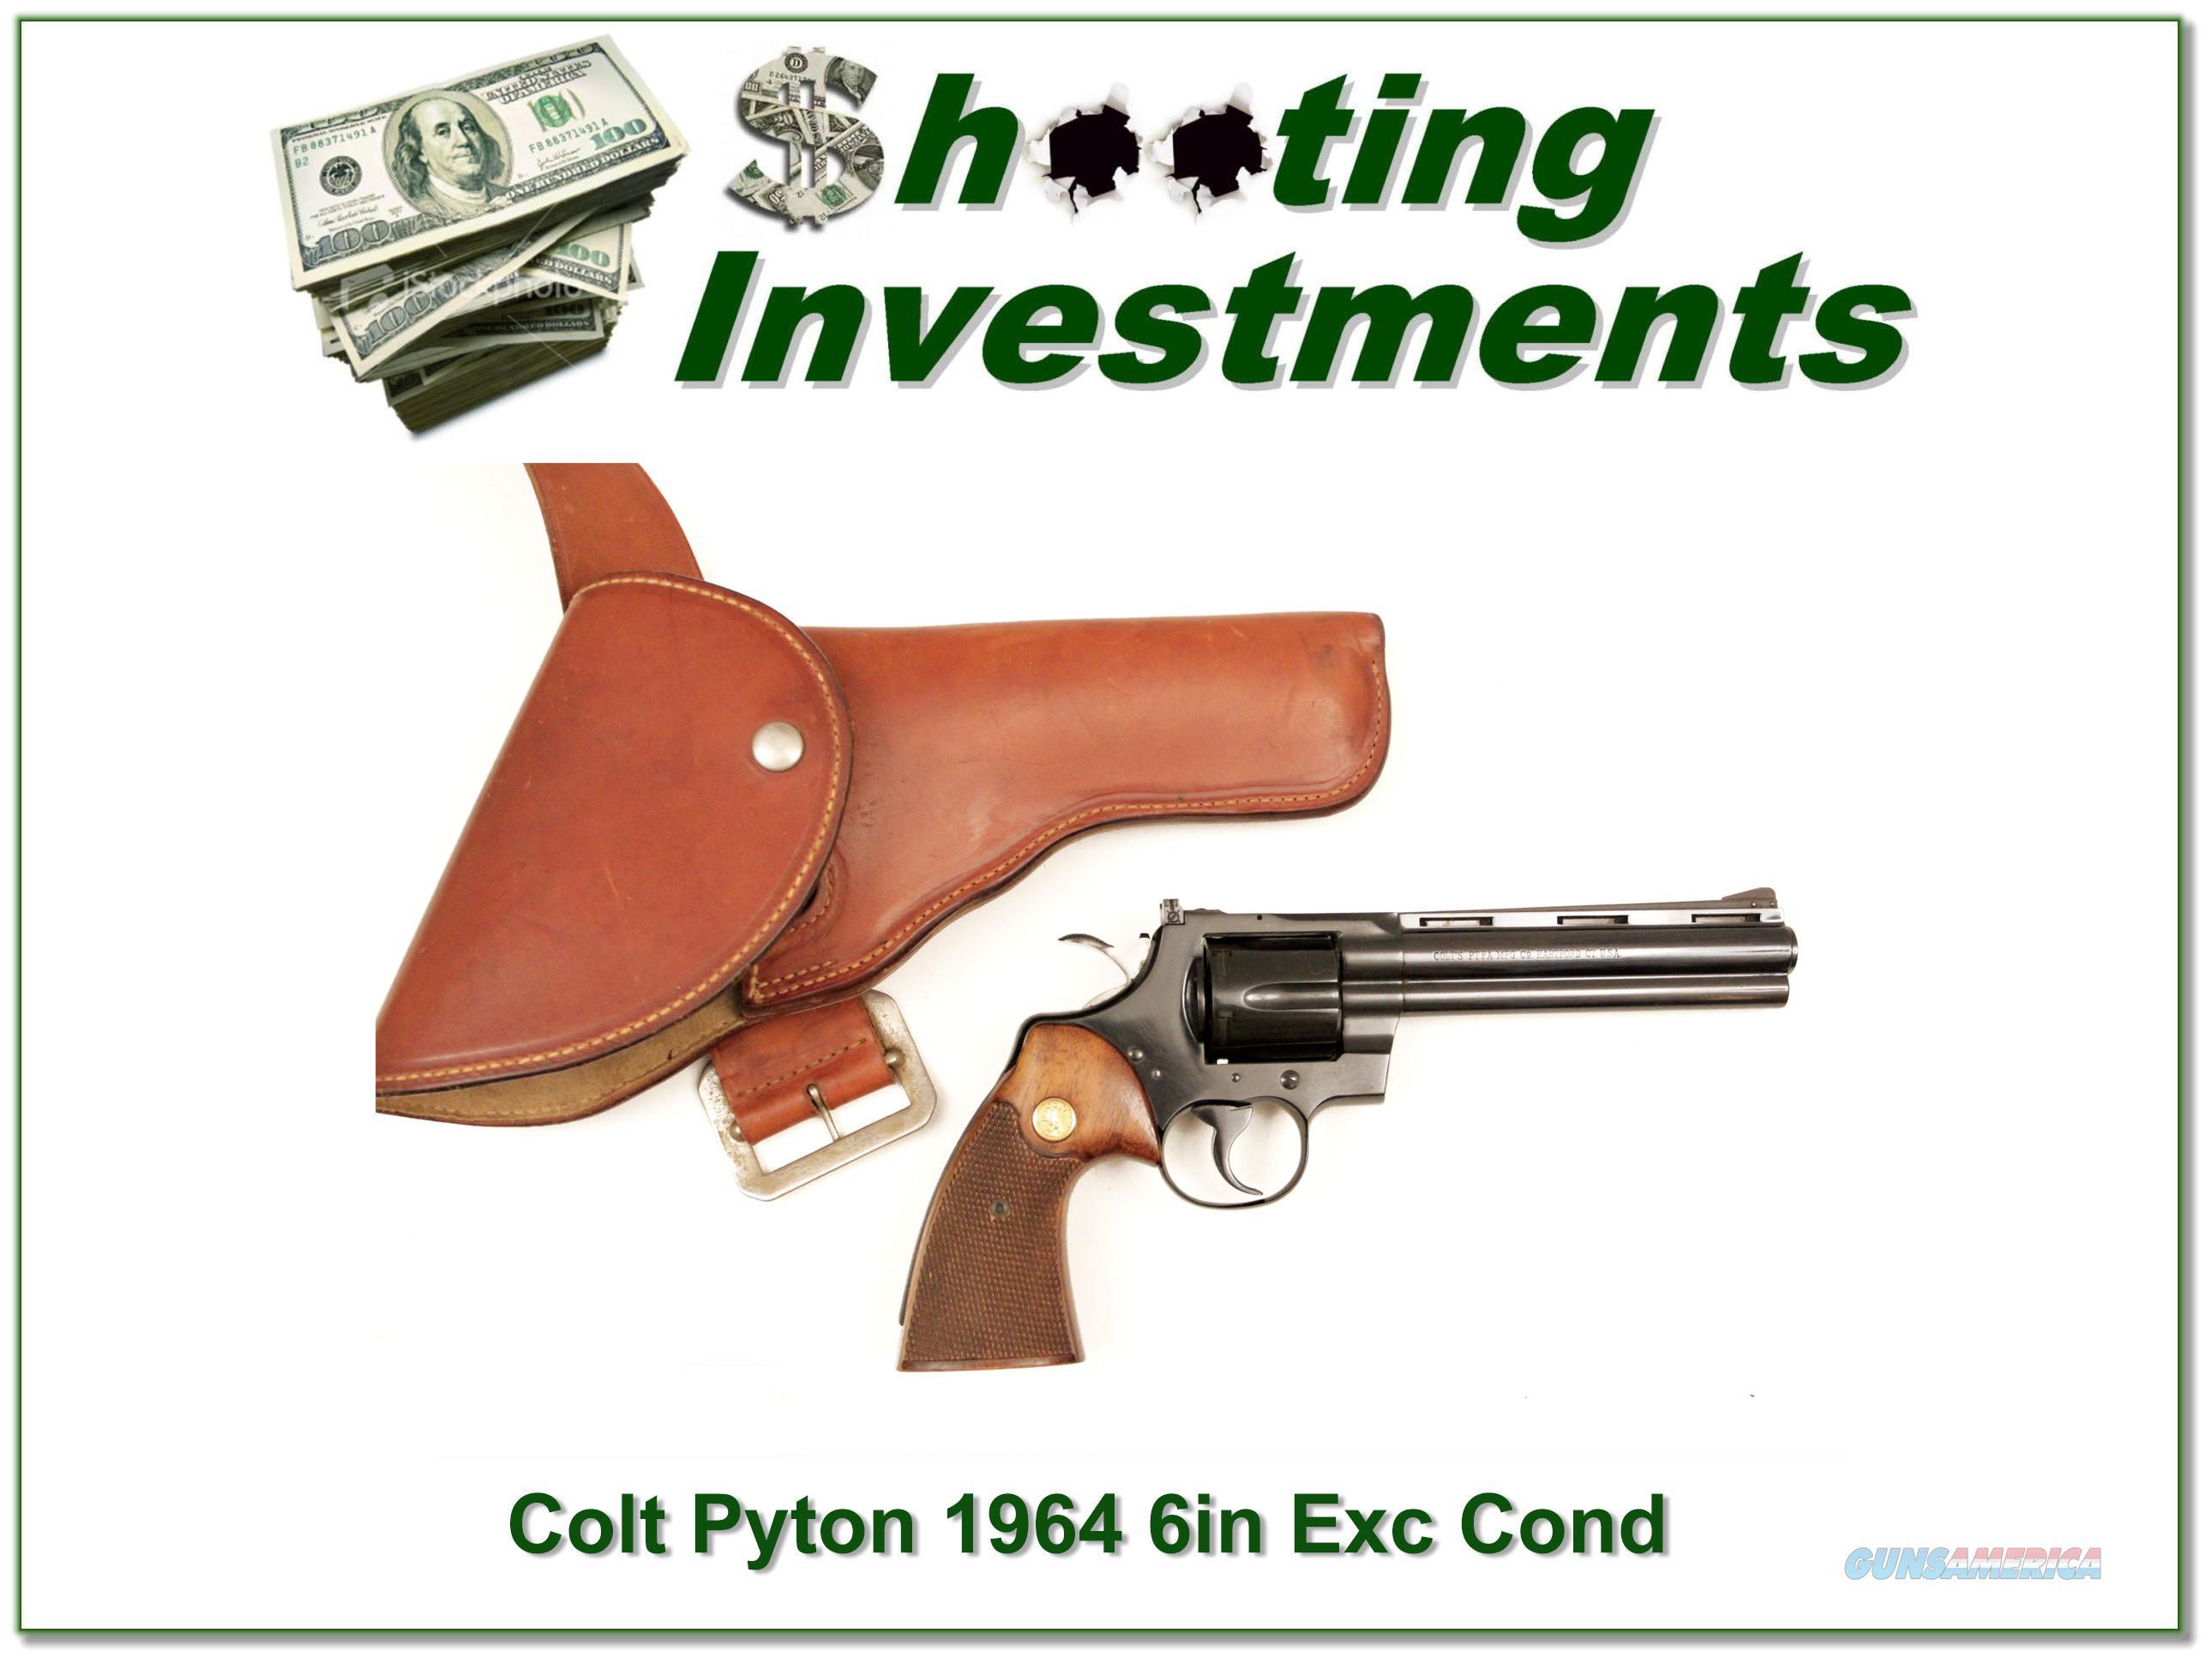 1964 Colt Python 6in near new